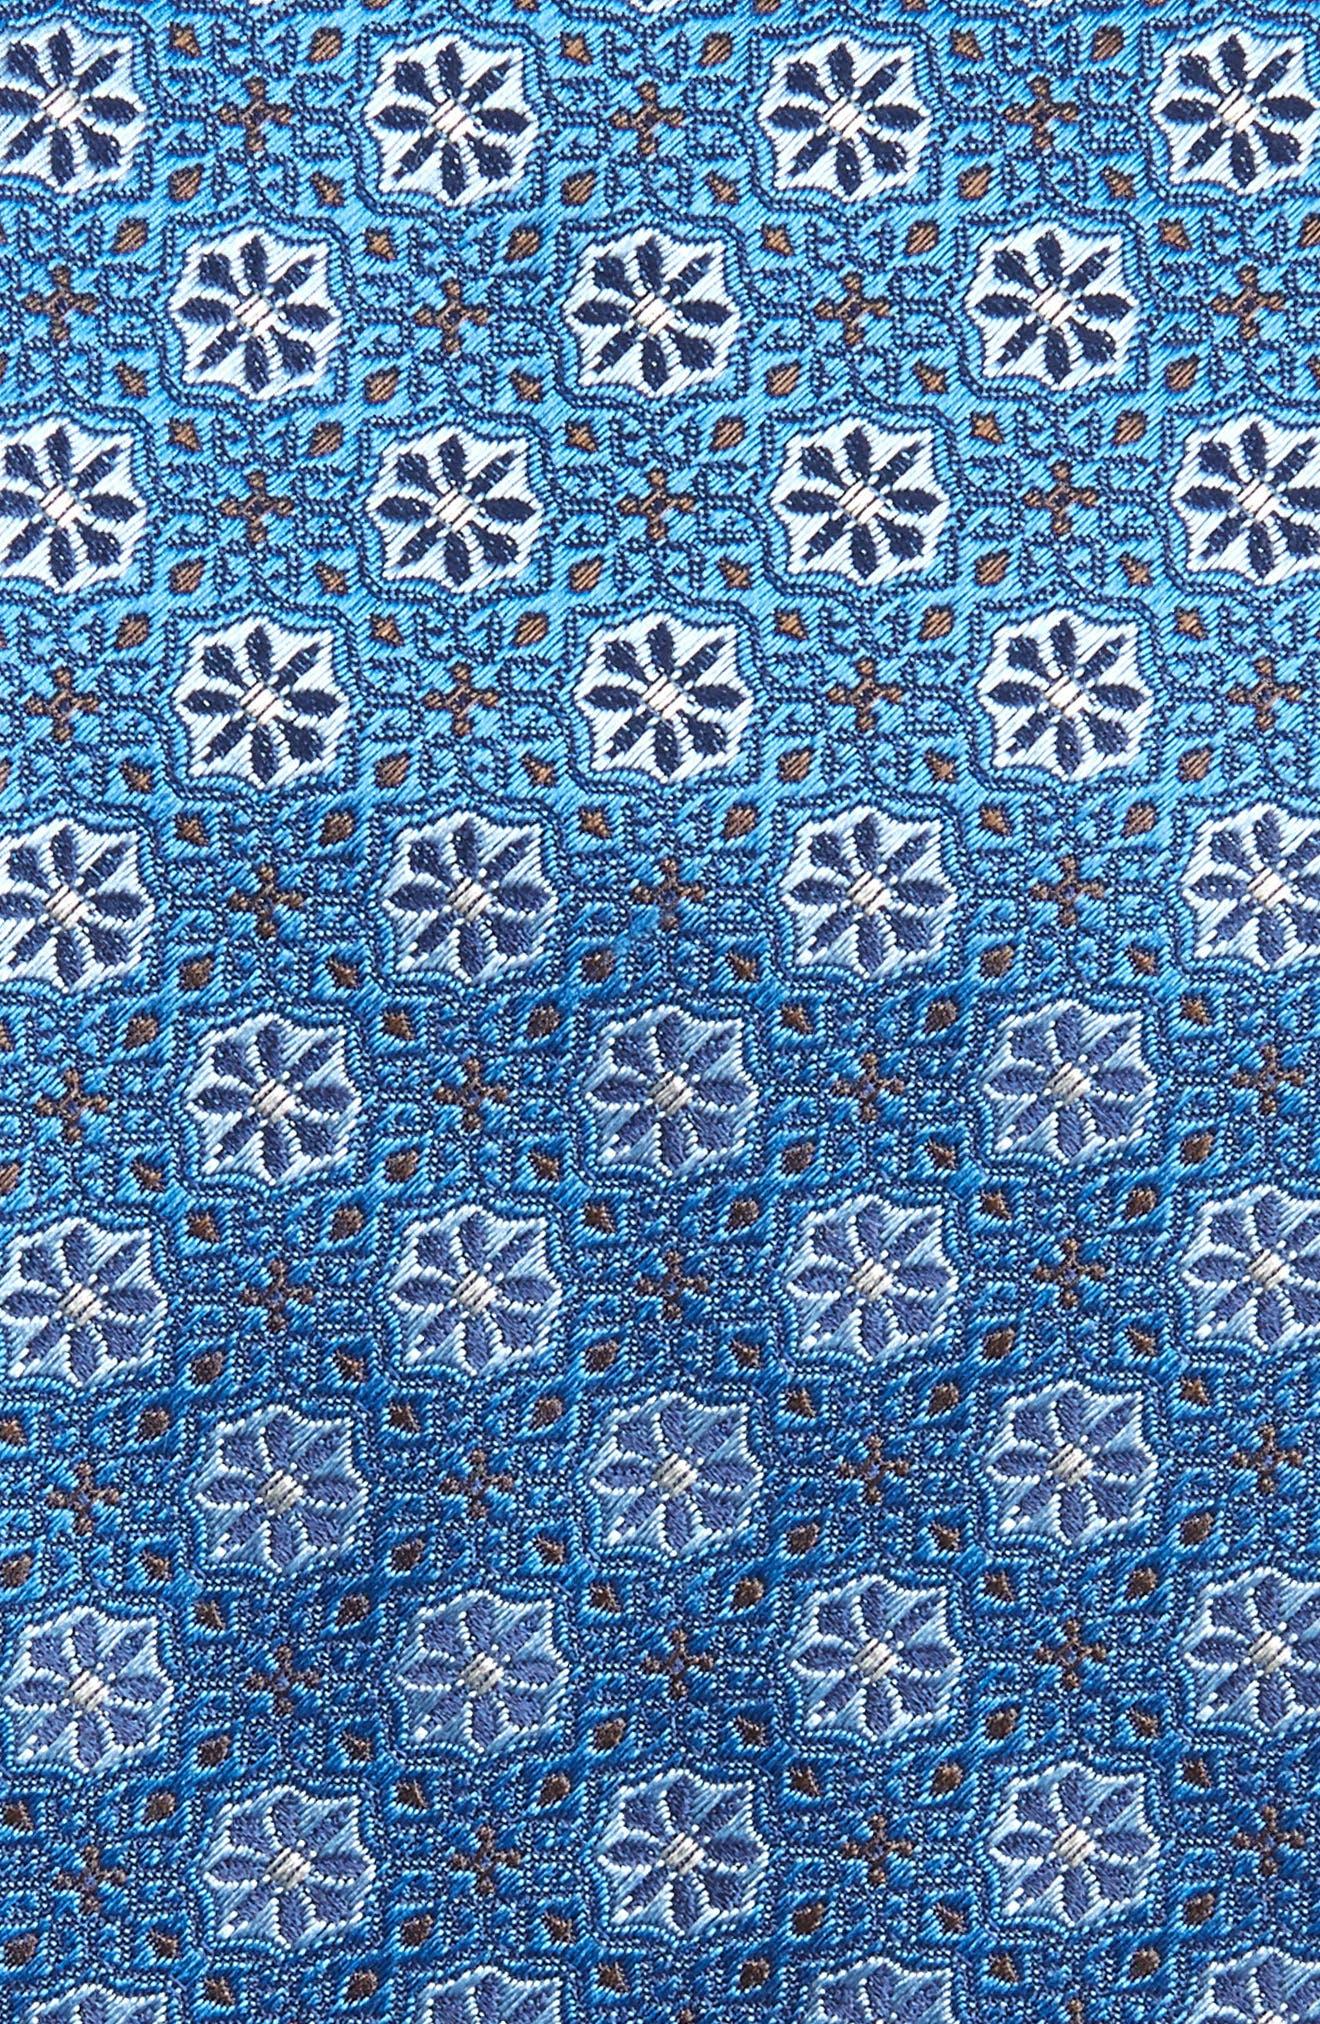 Medallion Silk Tie,                             Alternate thumbnail 2, color,                             Turquoise